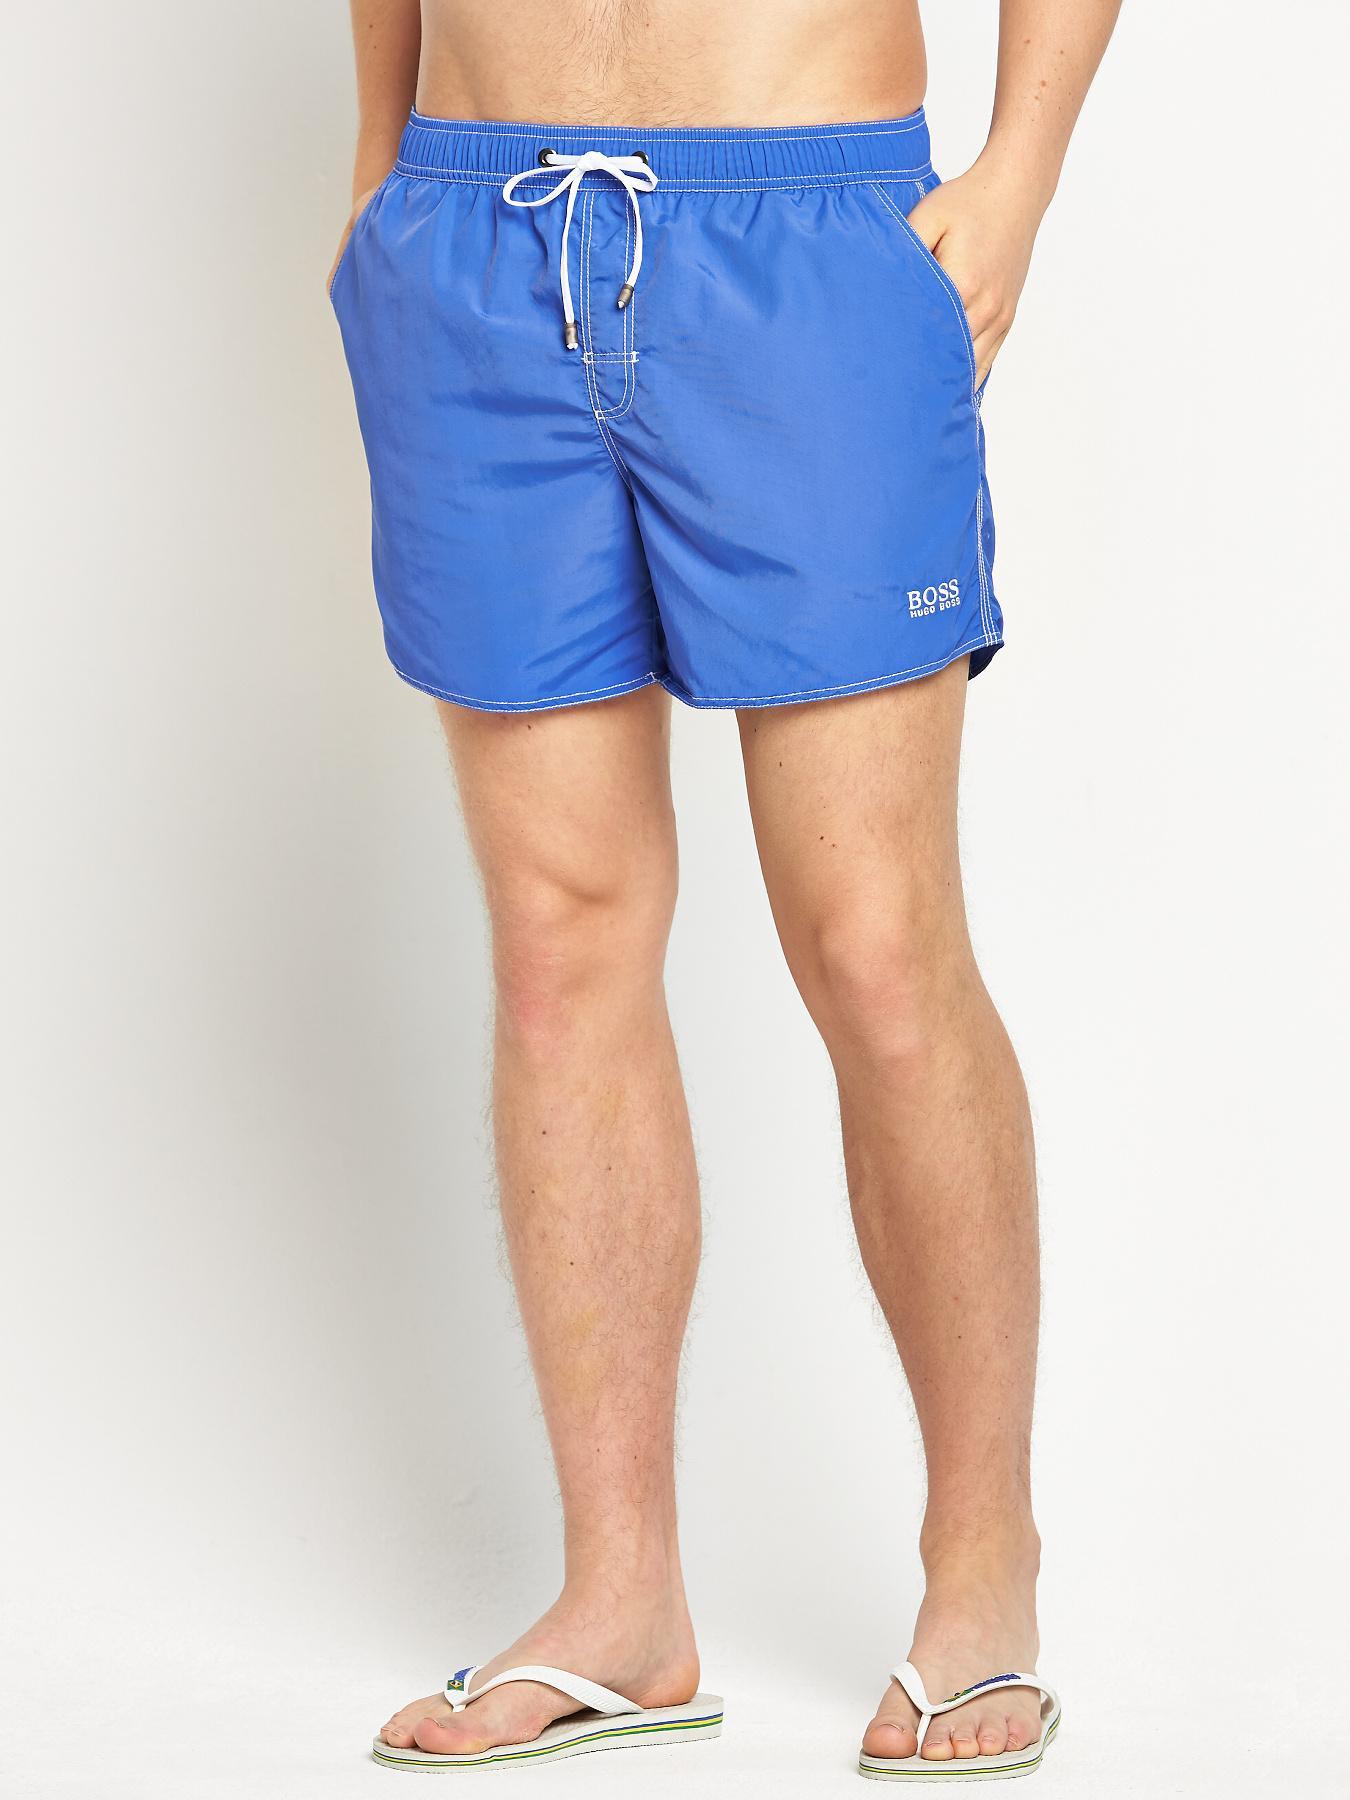 Hugo Boss Mens Lobster Swim Shorts - Blue - Blue, Blue